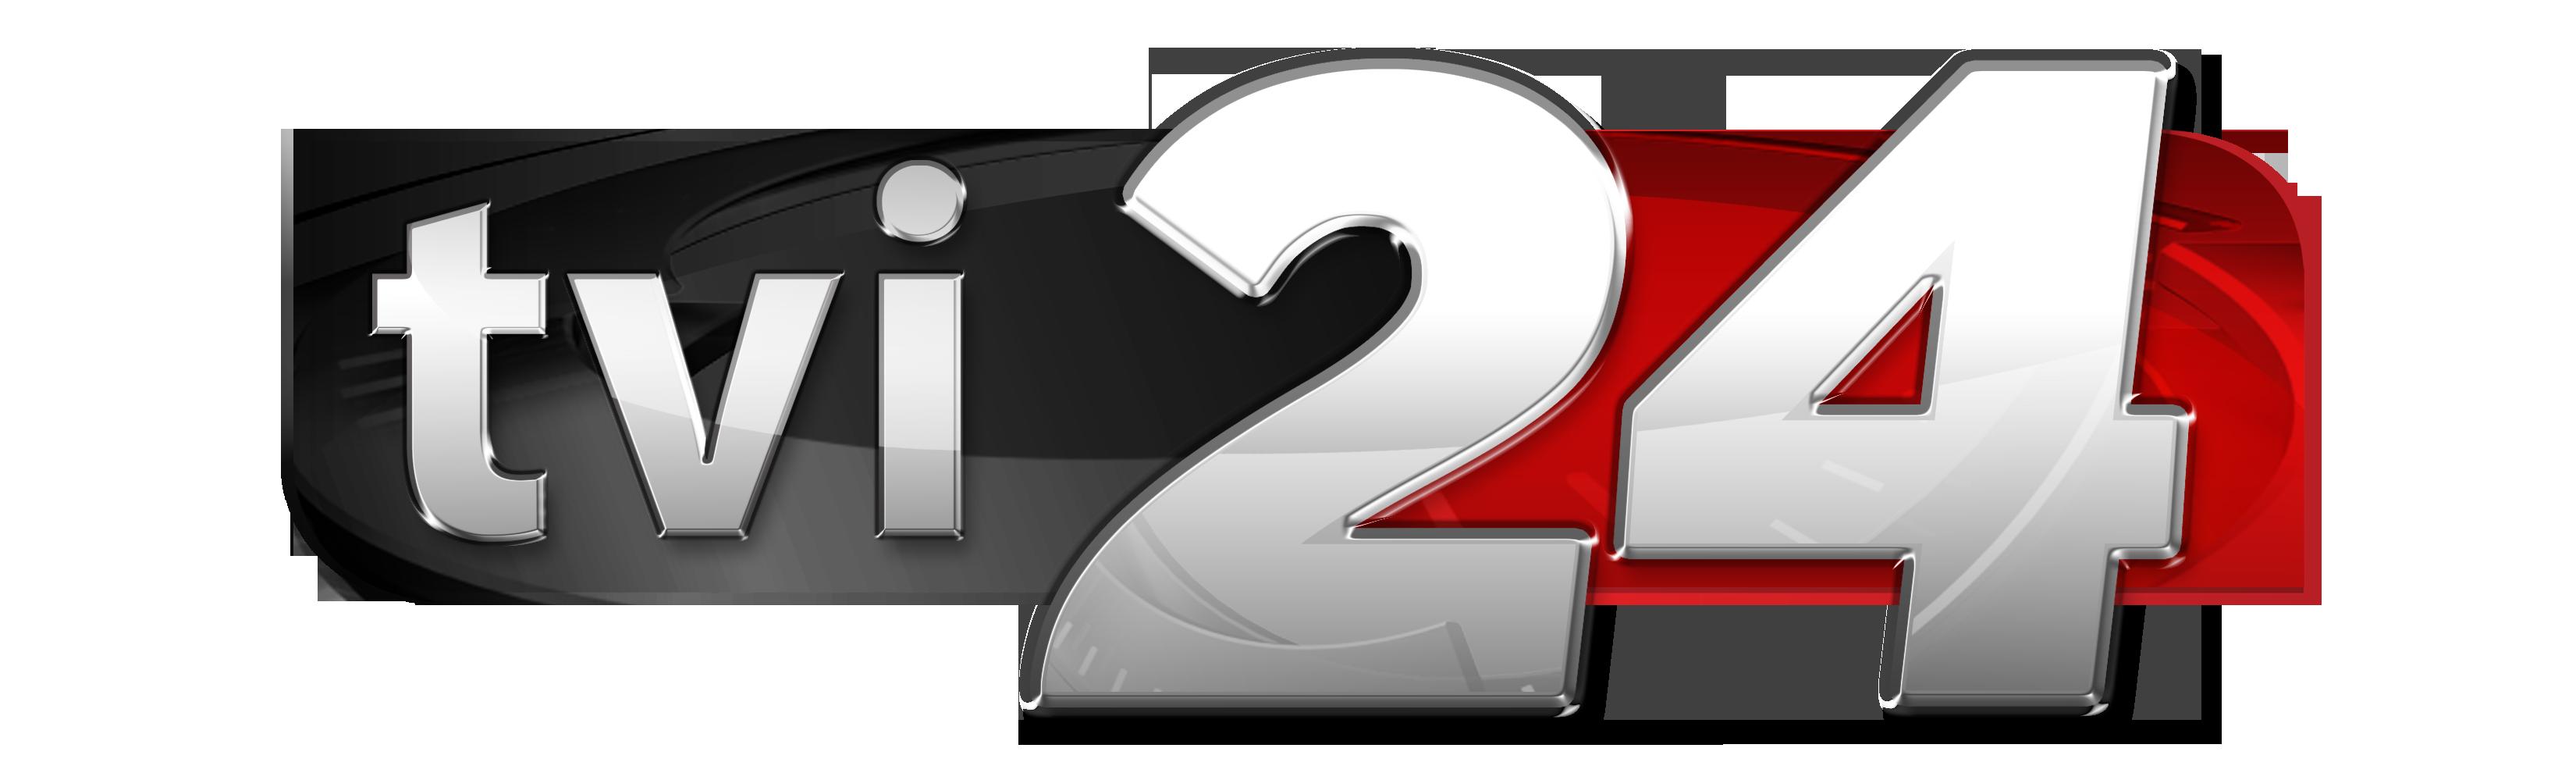 TVI24 com liderança recorde em prime-time